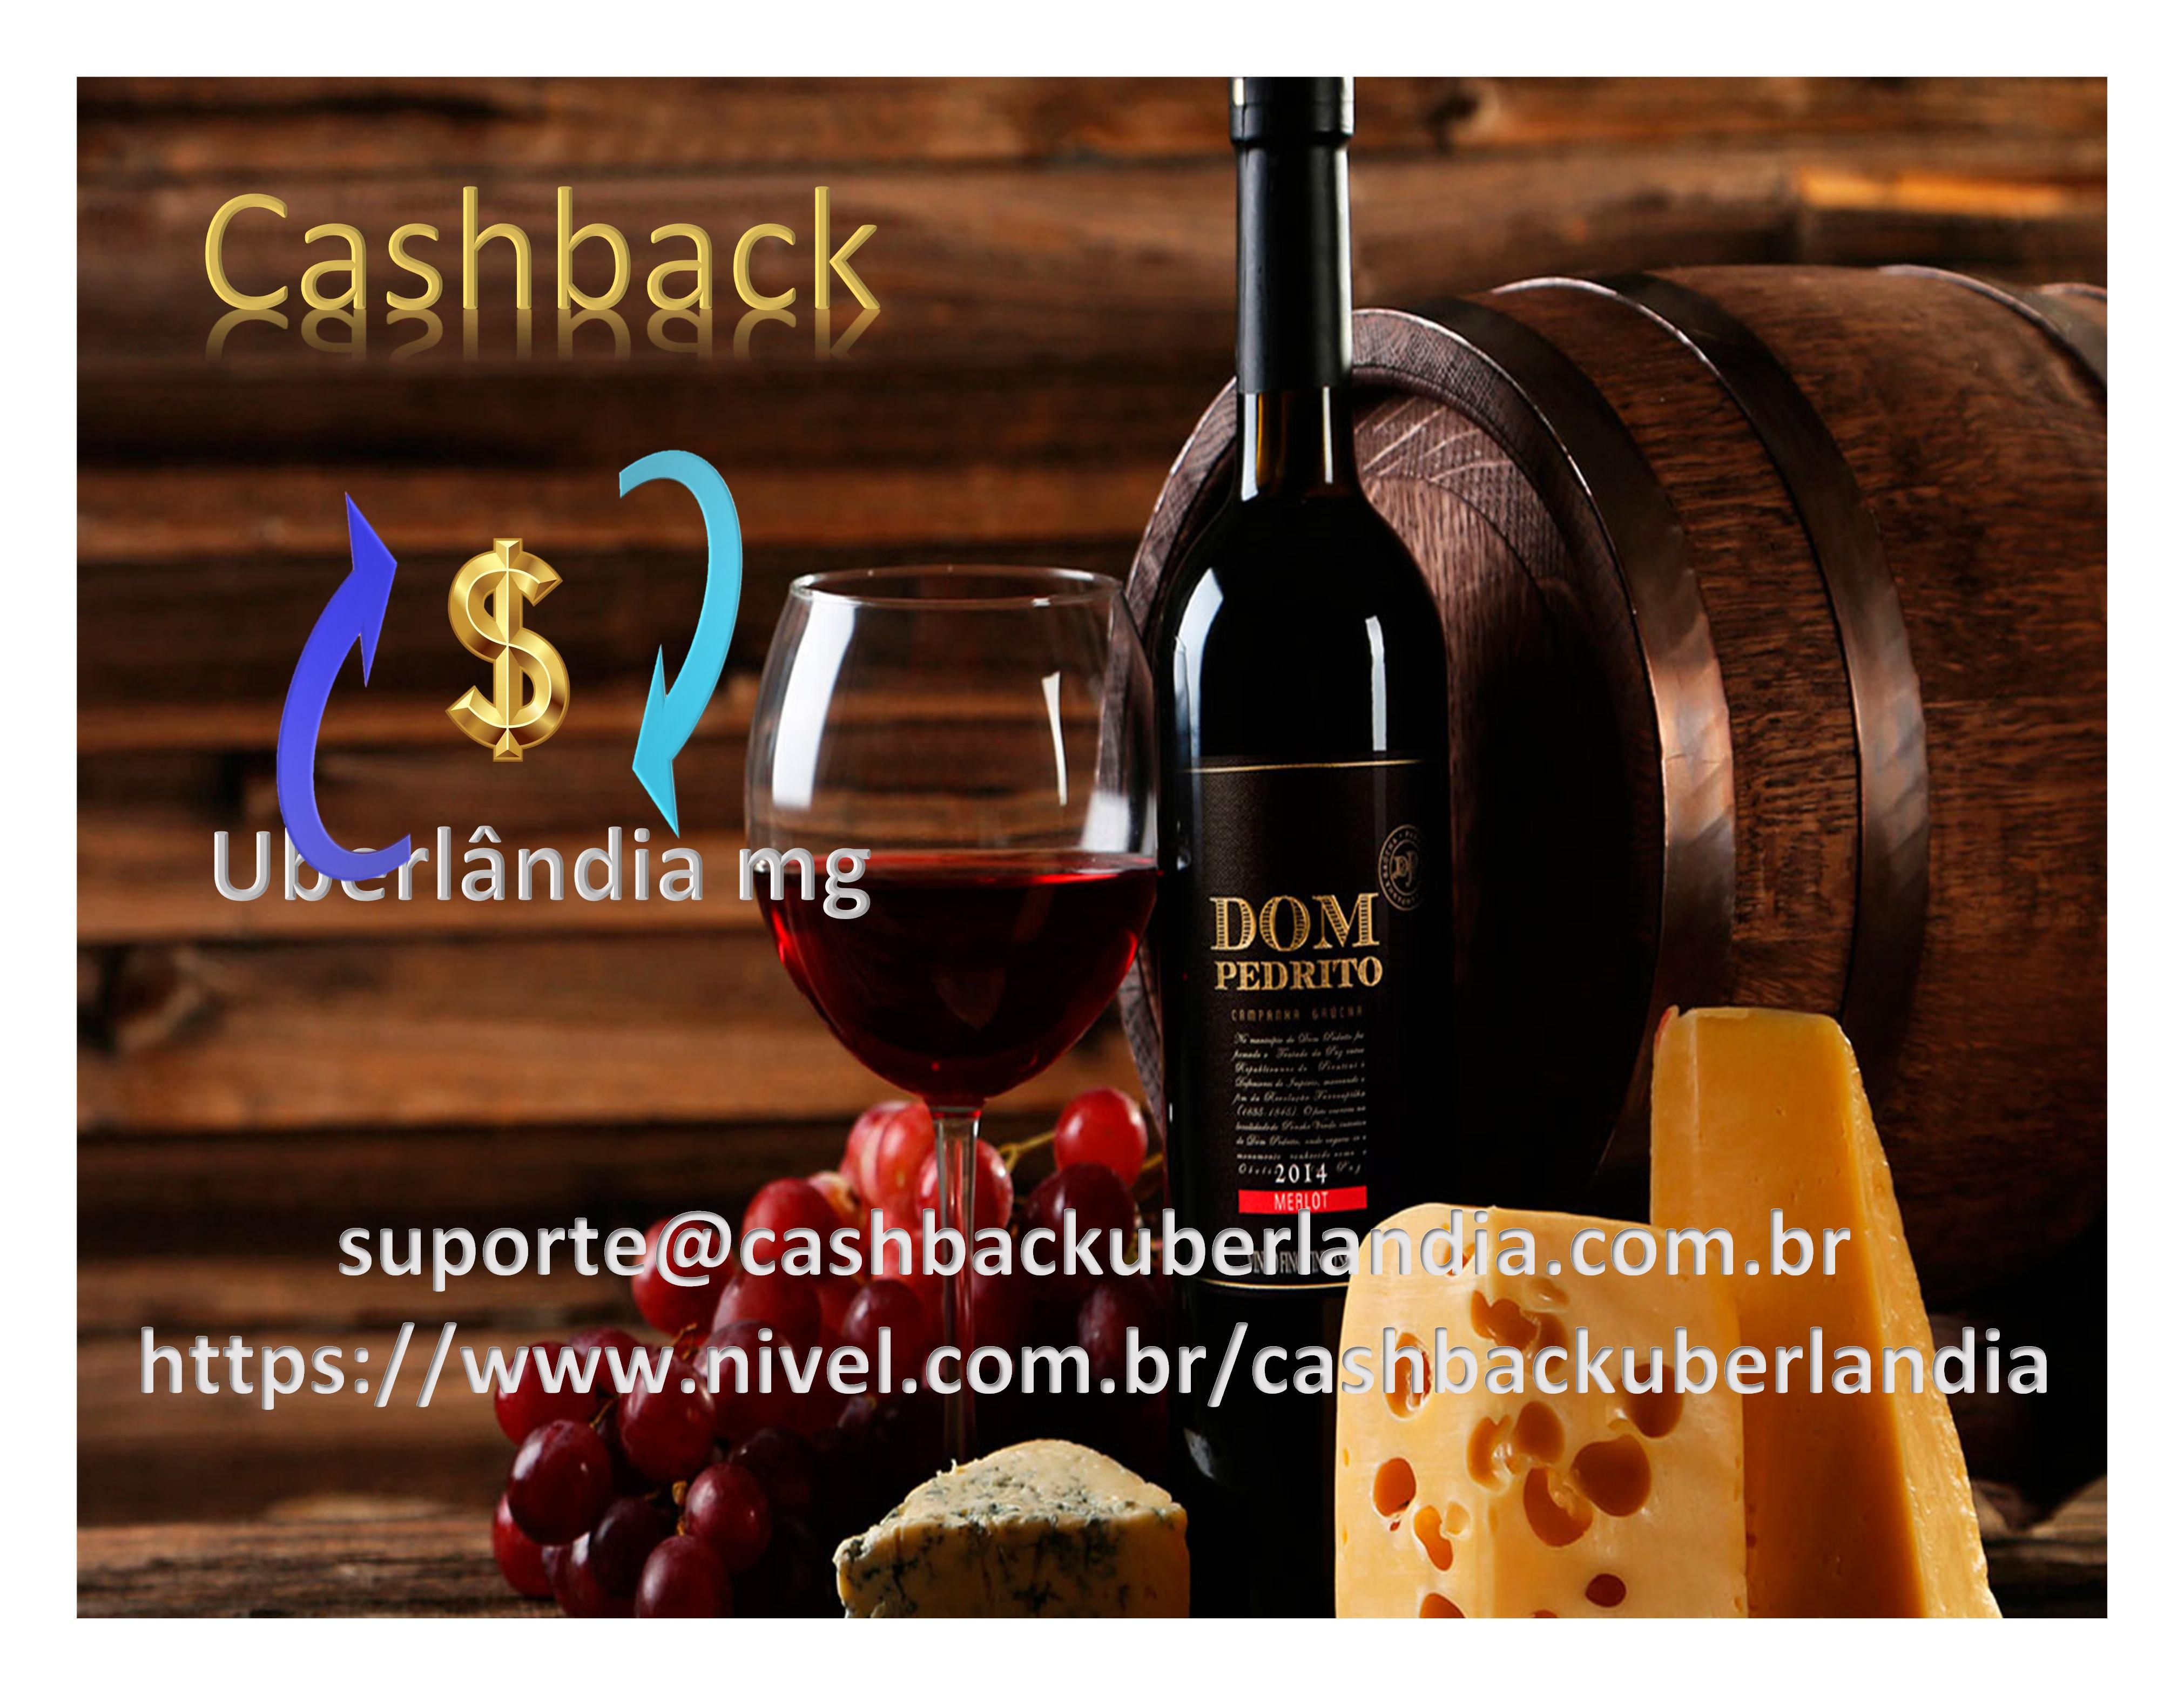 Cashback Uberlandia Marketng 1.2